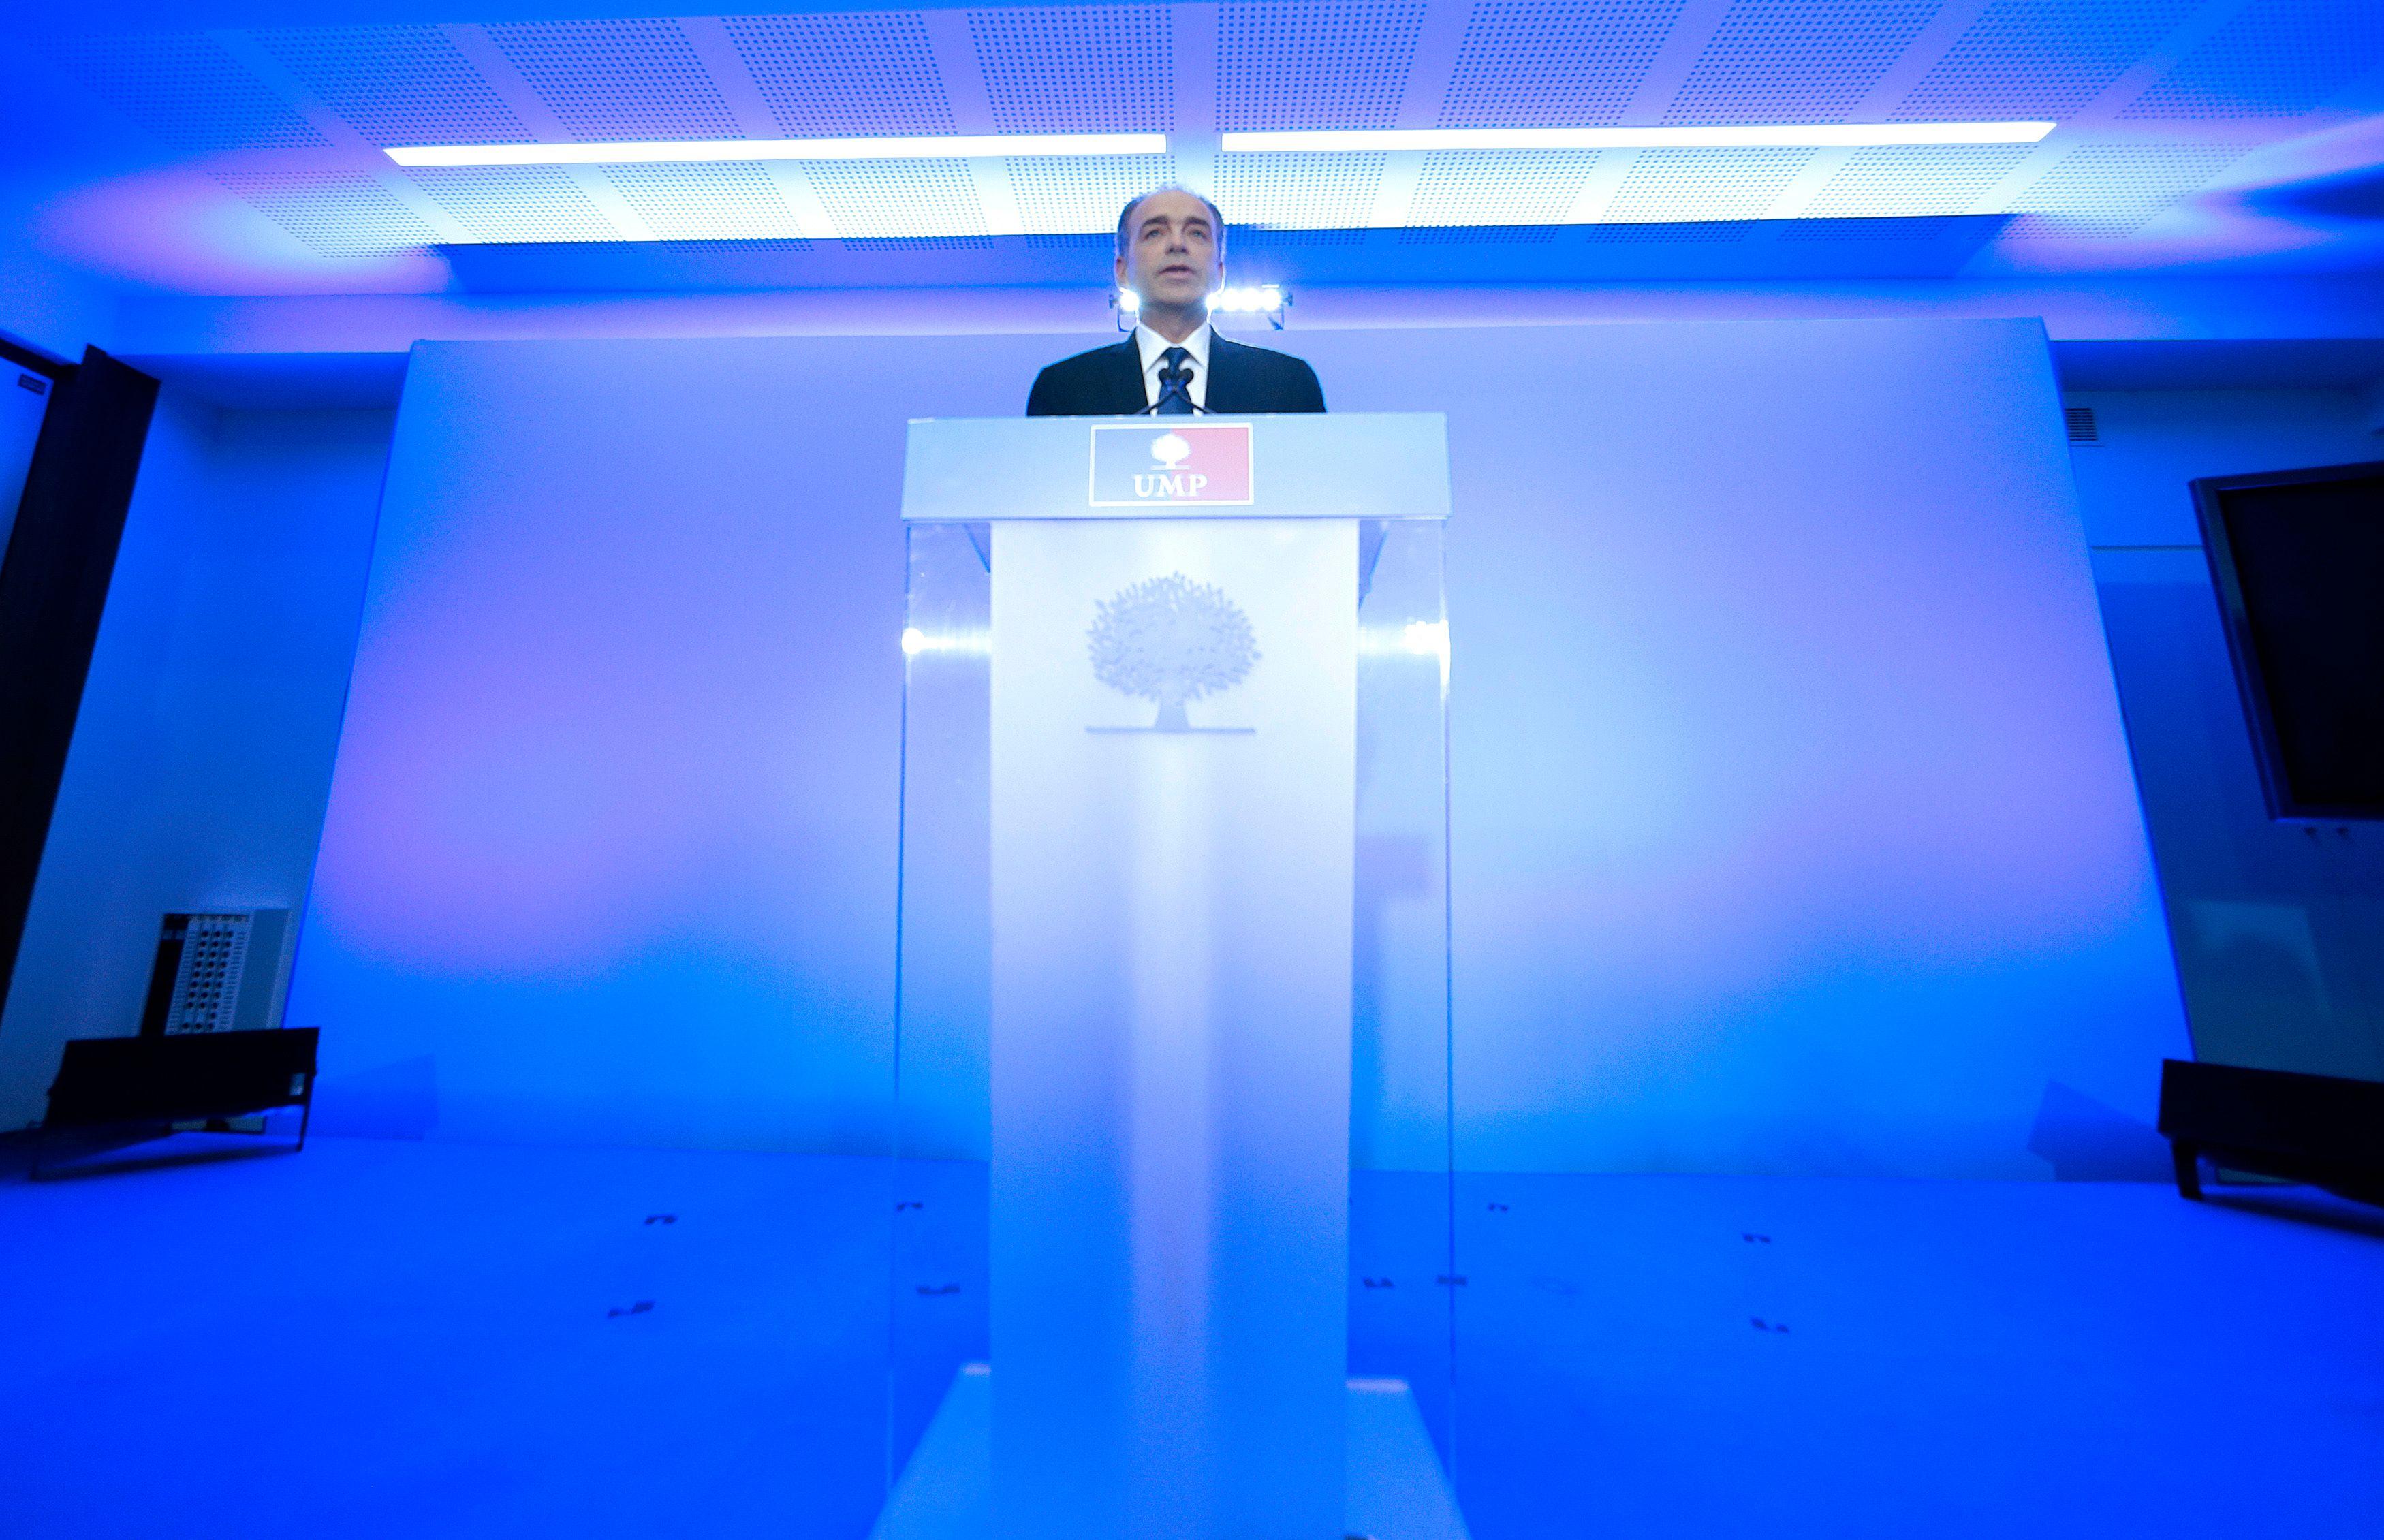 Le seul gagnant des rivalités internes au sein de l'UMP ? Nicolas Sarkozy.